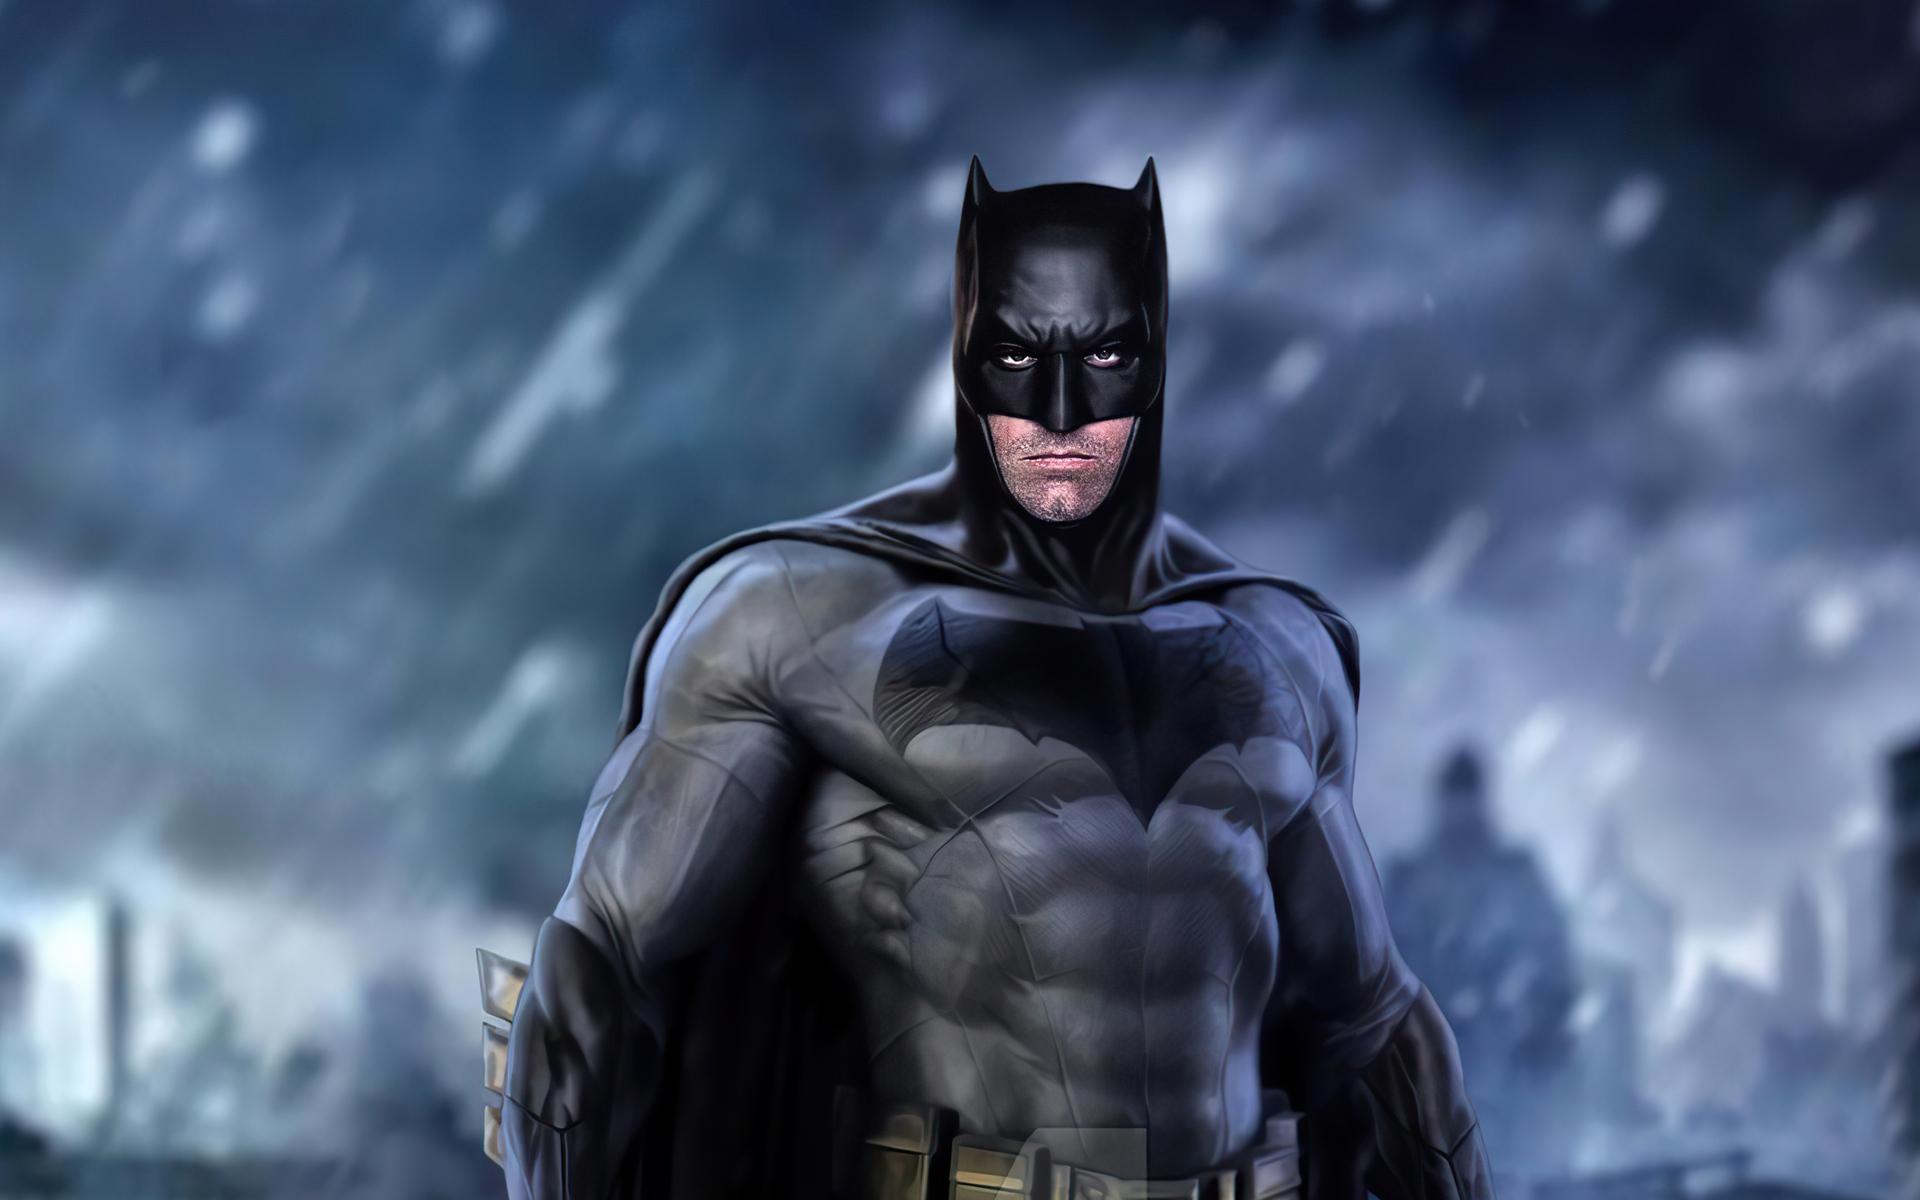 1920x1200 Batman Ben Affleck 2020 4k 1080P Resolution HD ...